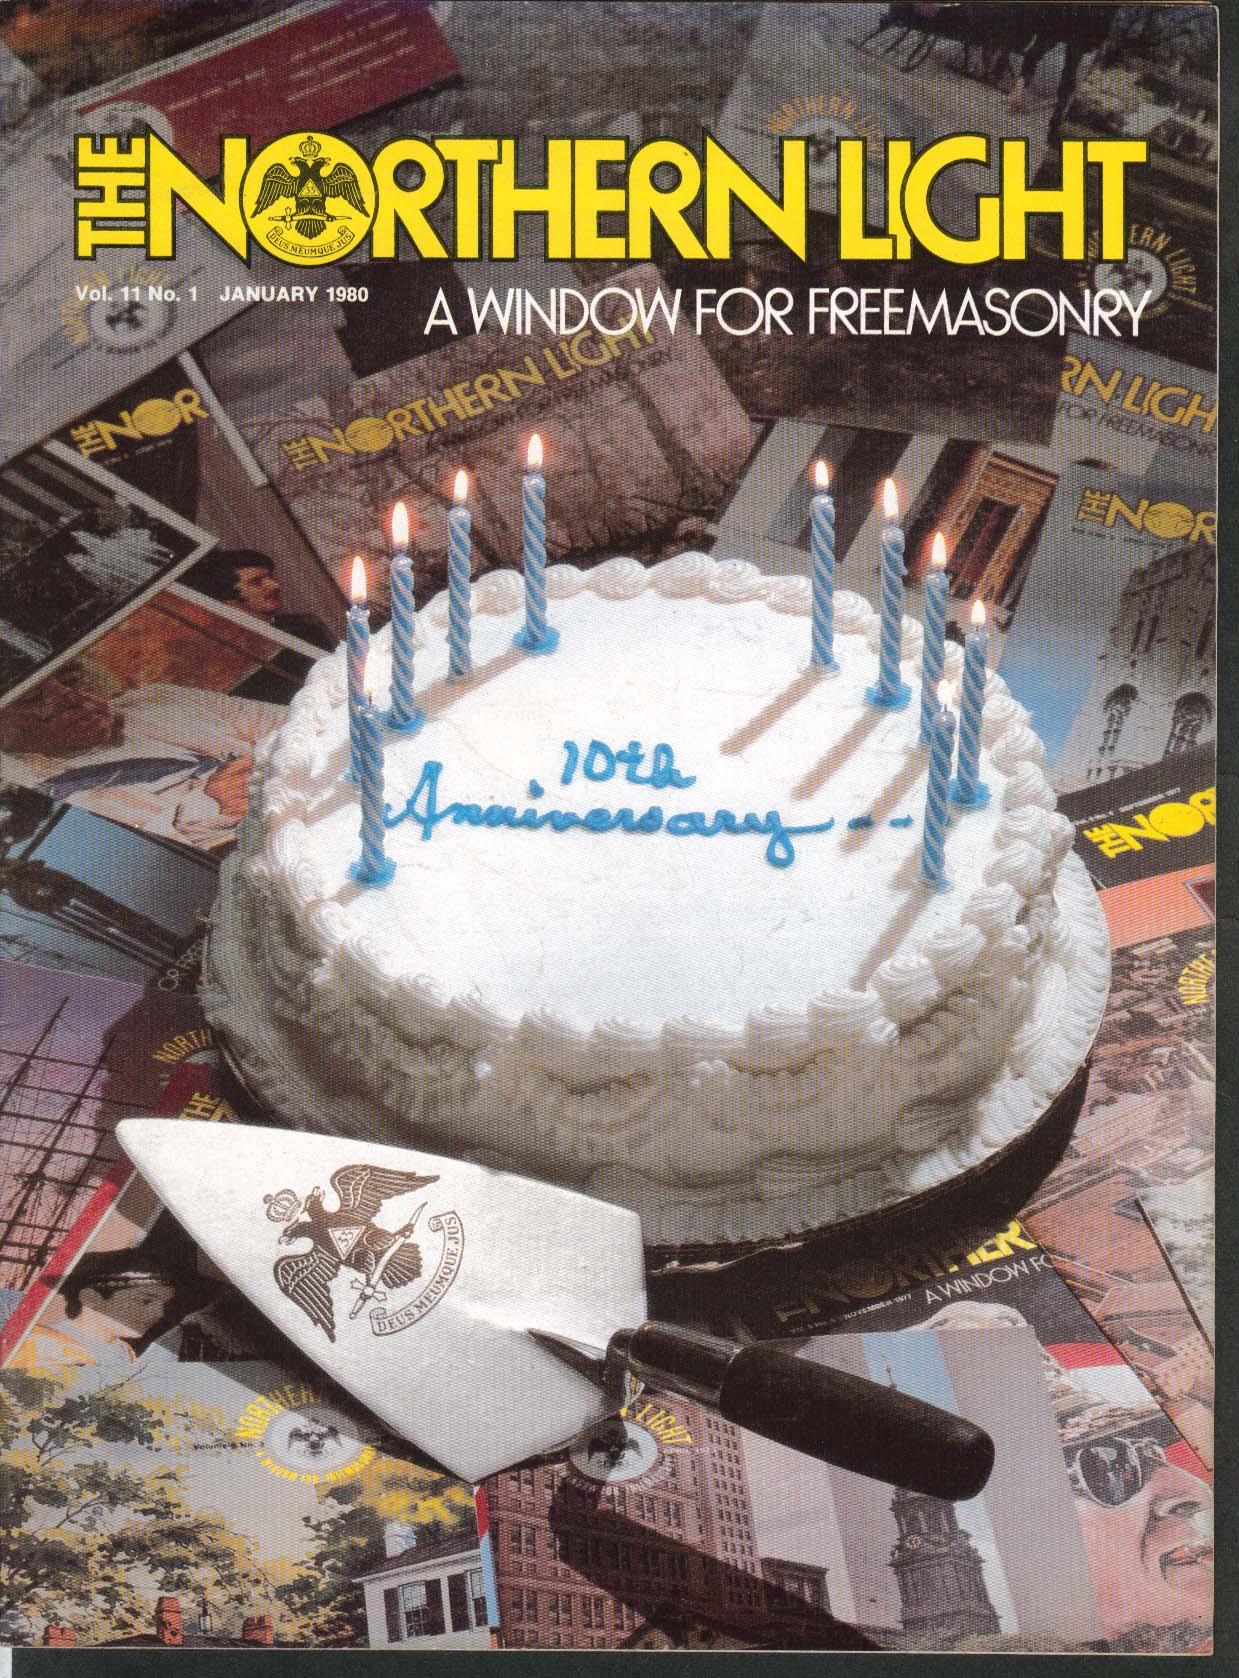 Image for NORTHERN LIGHT Vol 11 #1 William Pitt Tavern New Hampshire Masonic Lodge 1 1980